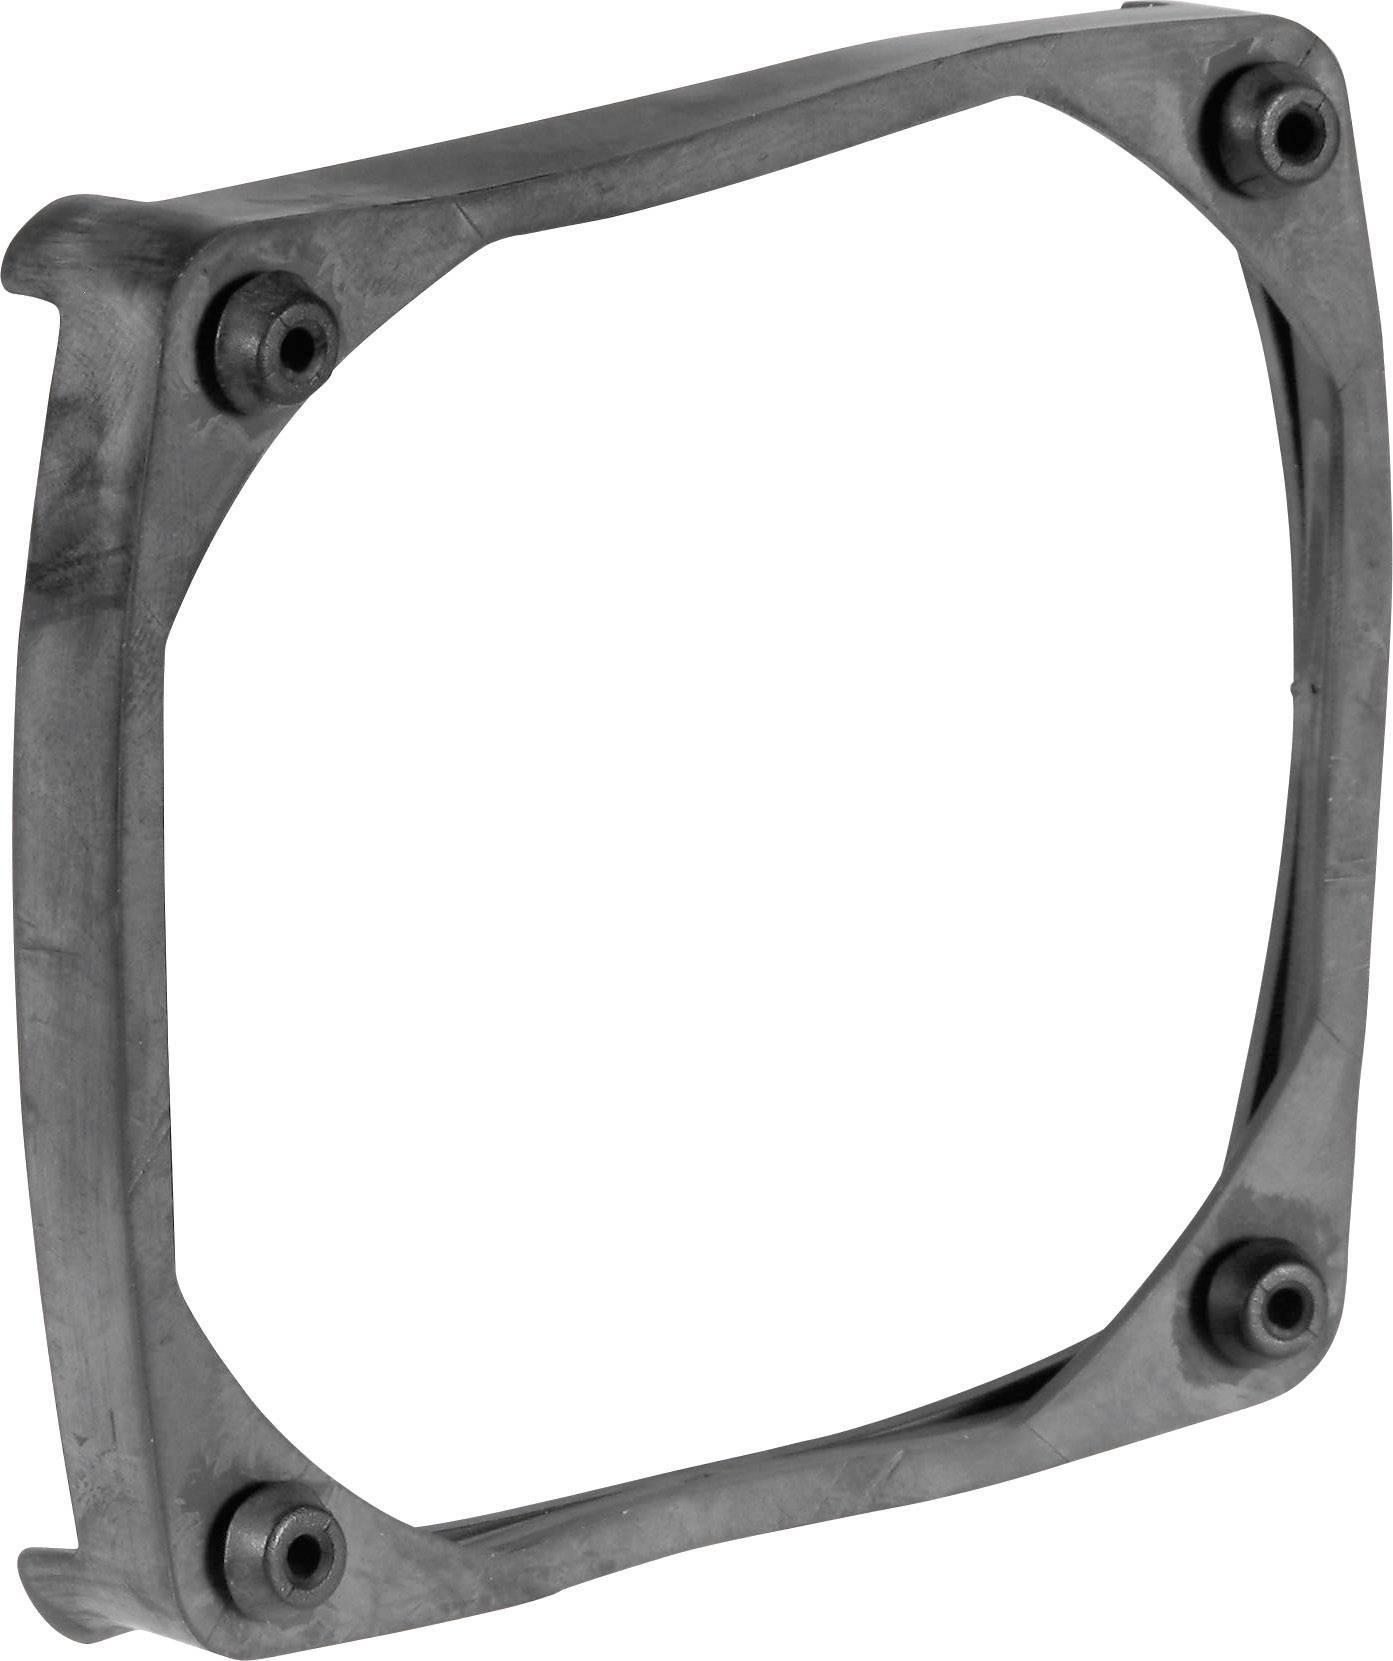 Elastická upevňovací manžeta pro ventilátor SEPA LM92A1, 97 x 97 x 9.5 mm